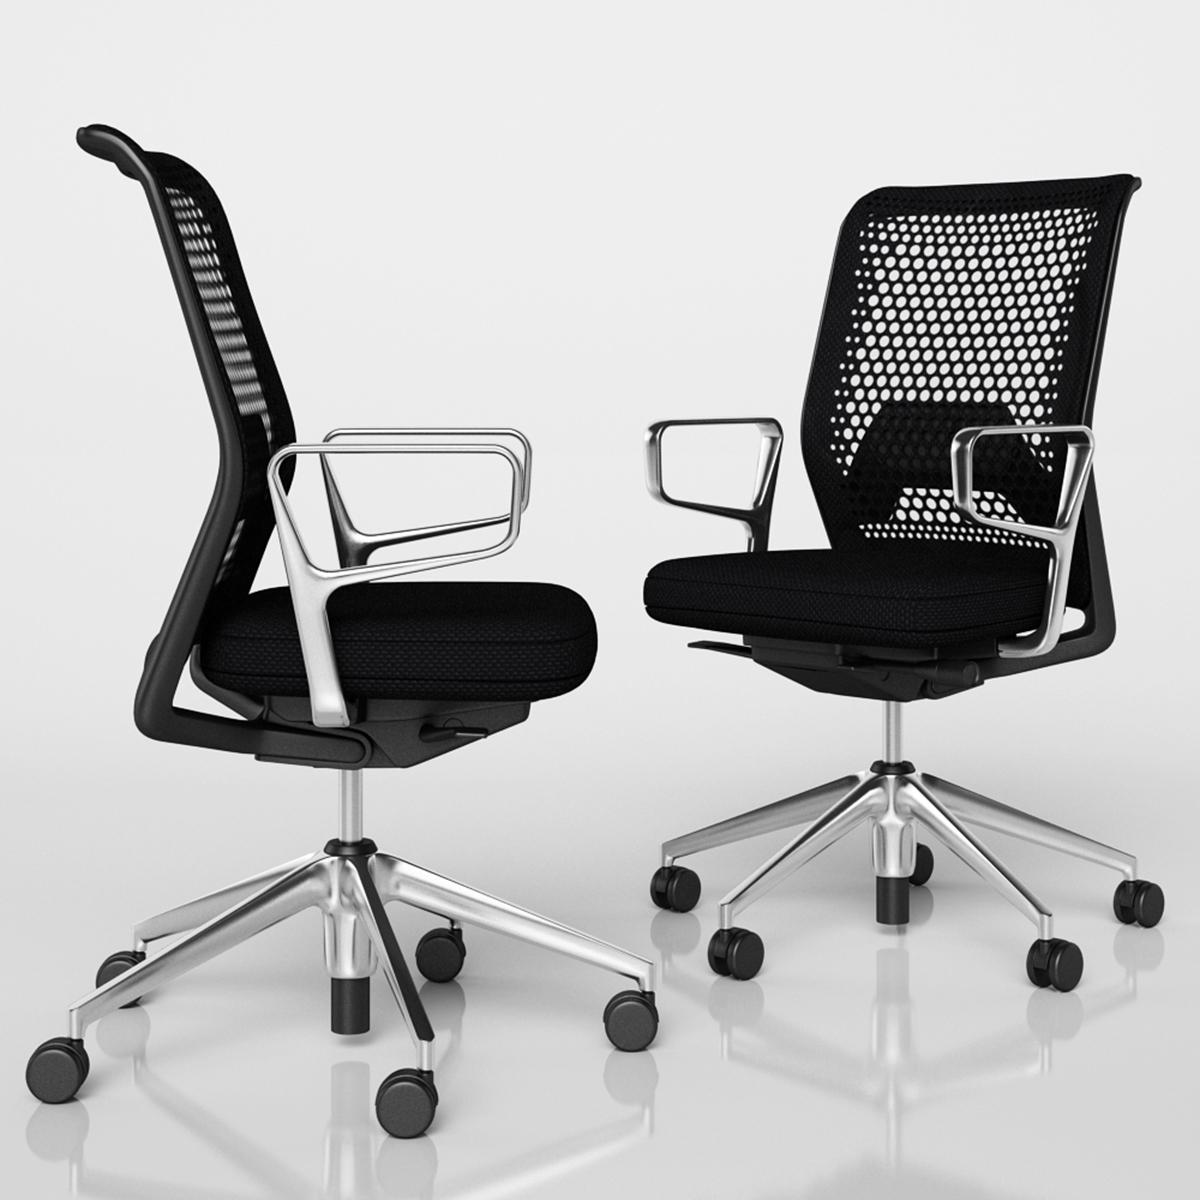 Phenomenal Vitra Id Mesh Swivel Chair By Antonio Citterio Gamerscity Chair Design For Home Gamerscityorg